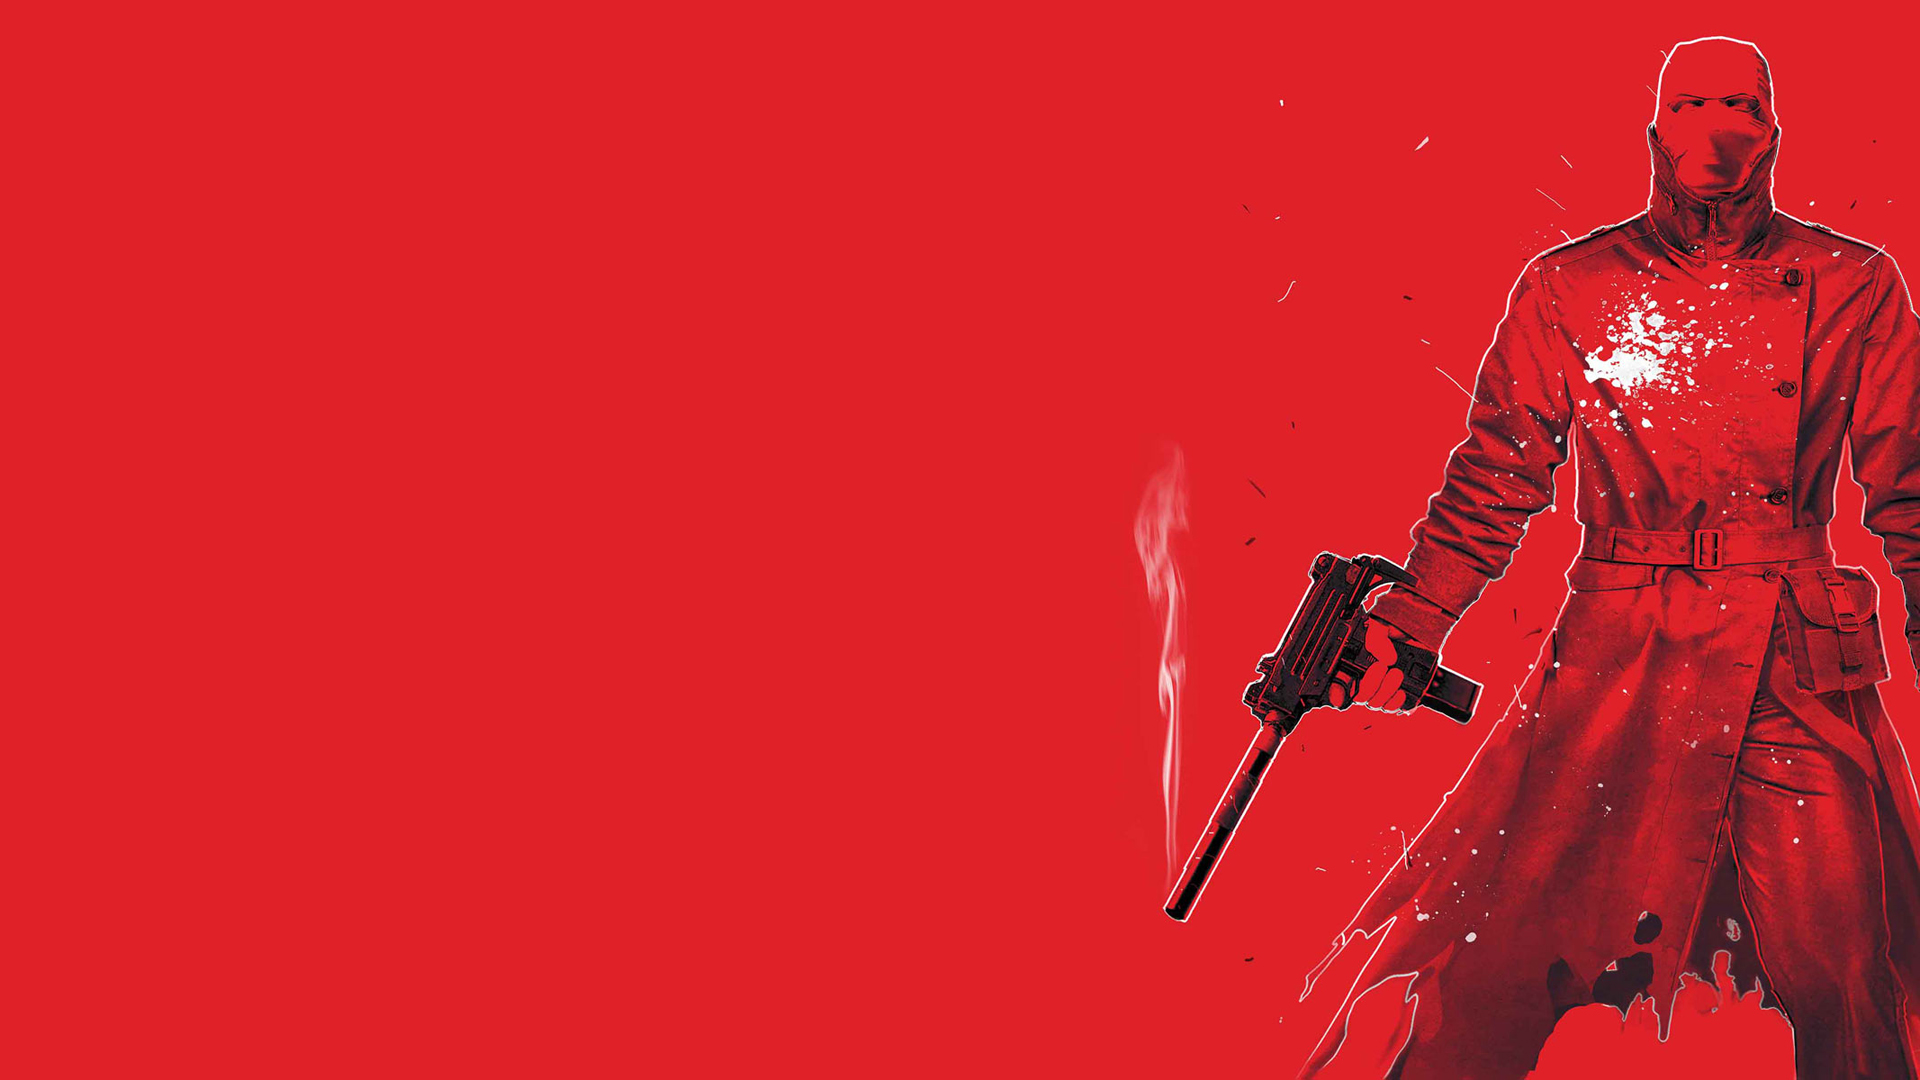 dc comics red hood batman